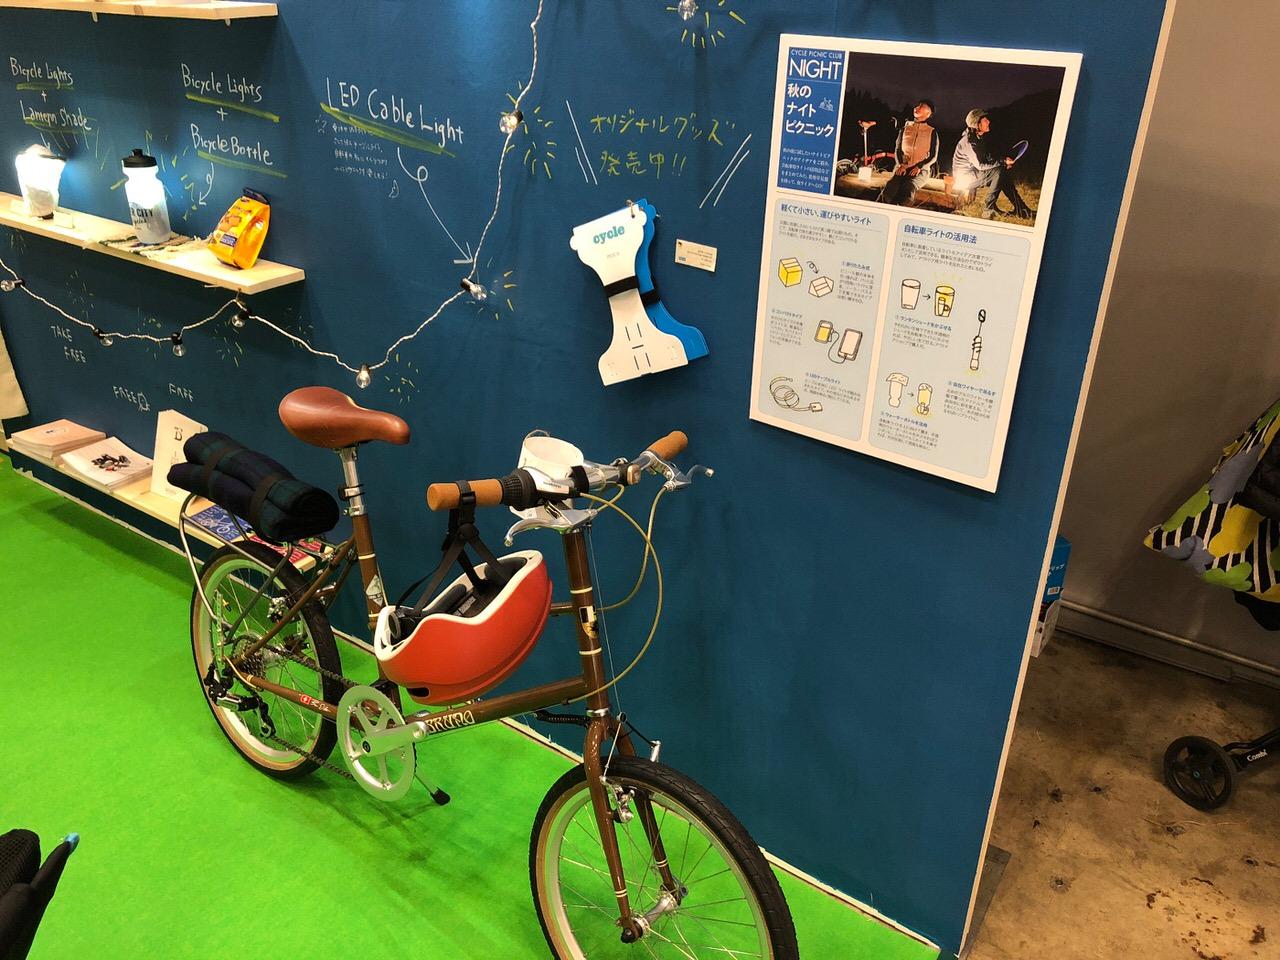 Cyclemode 0547